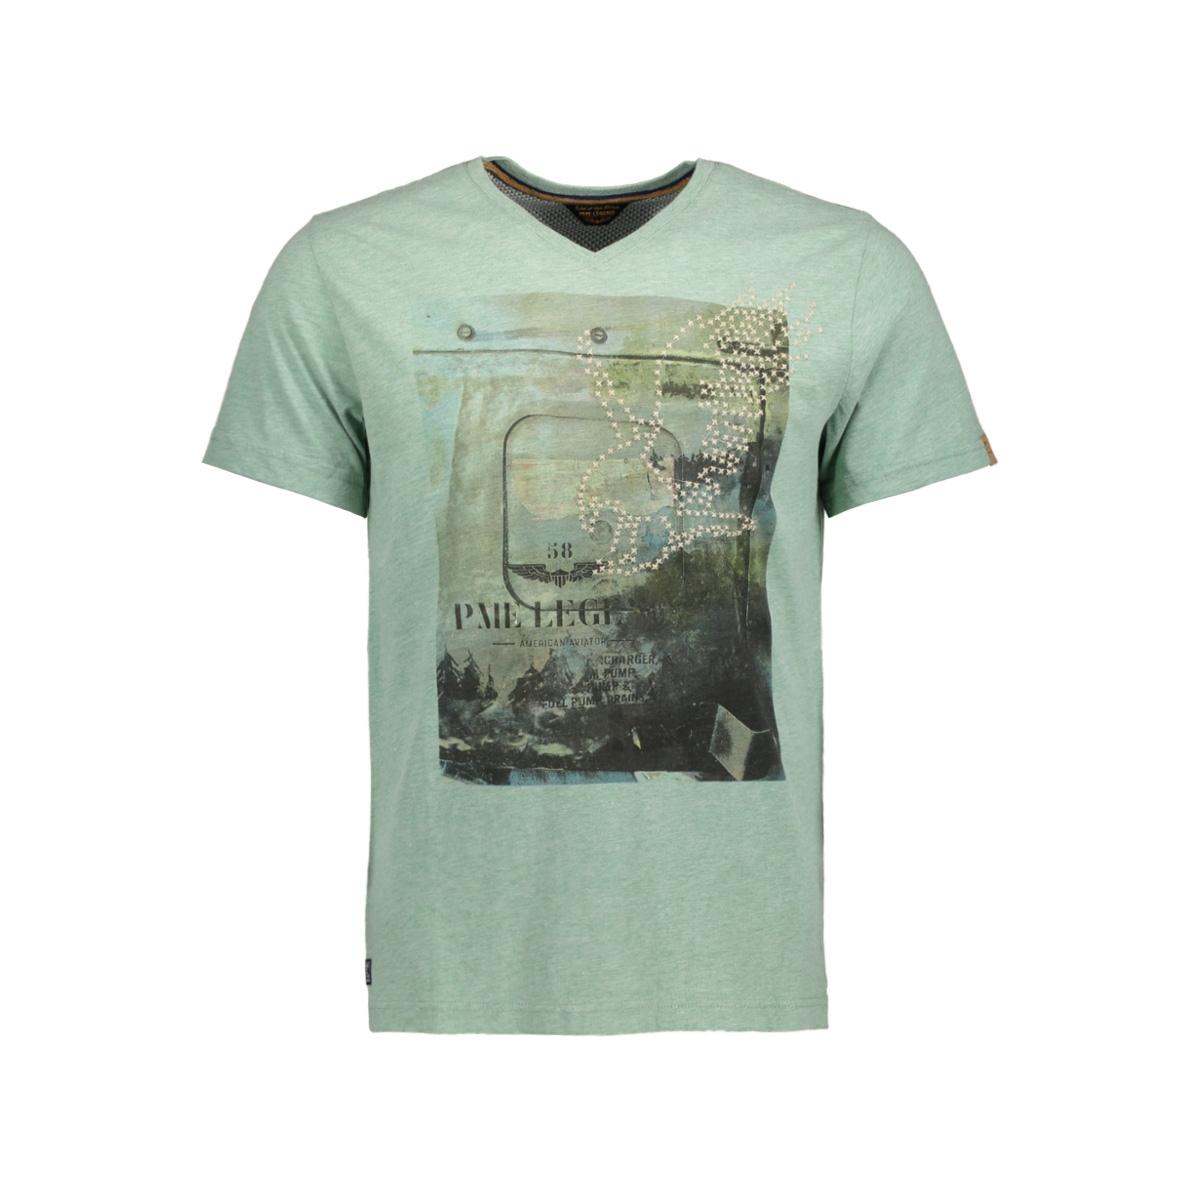 ptss178543 pme legend t-shirt 601